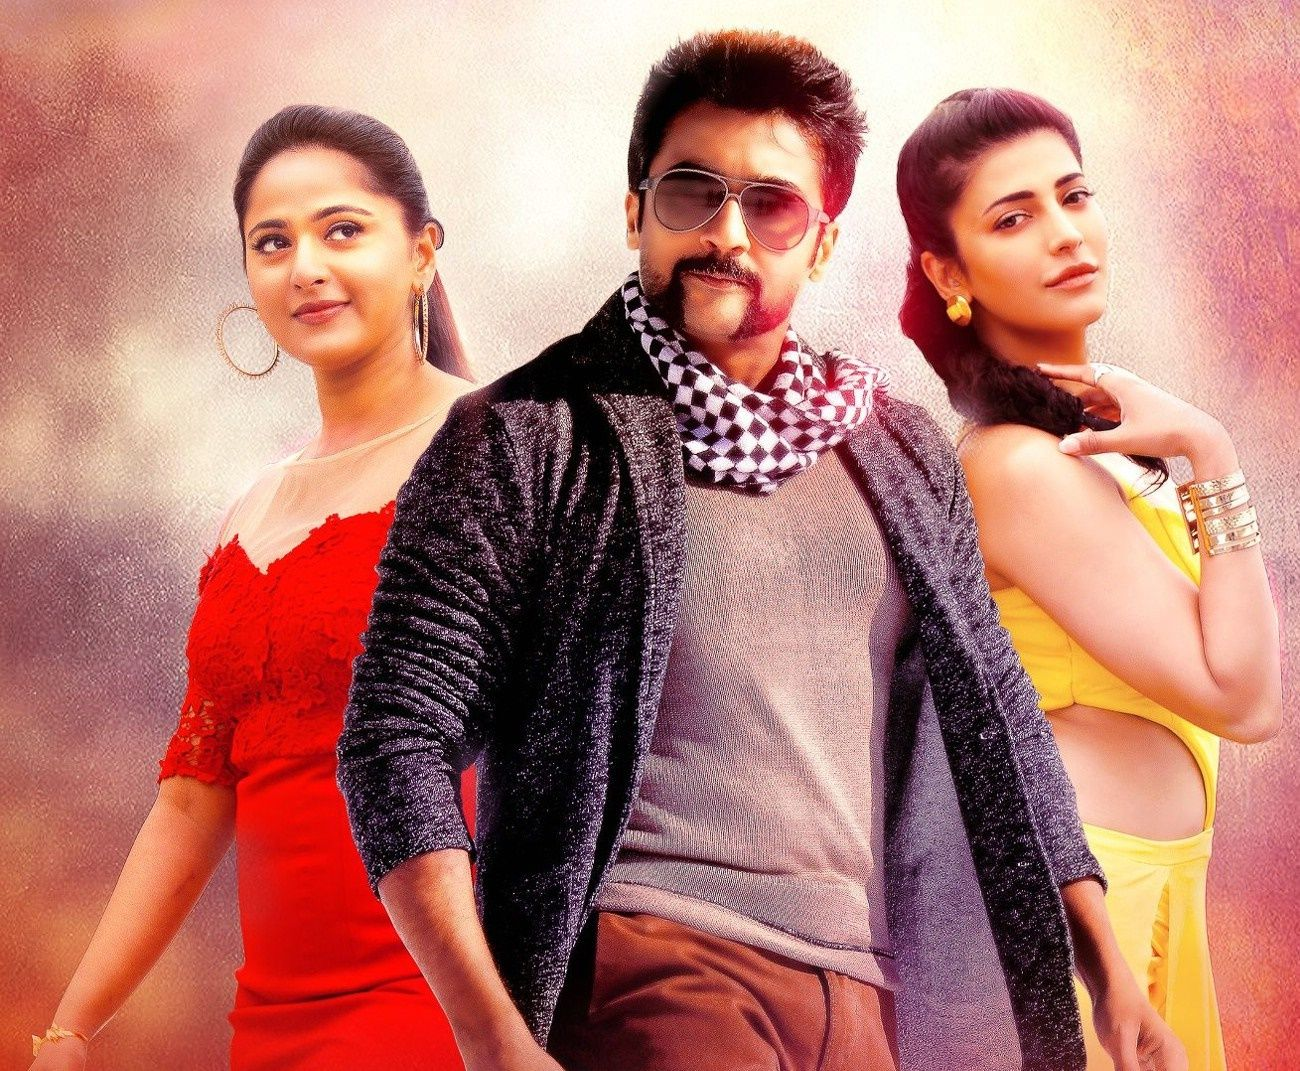 S3 Singam 3 Tamil Movie Latest Stills Hd Surya Movies